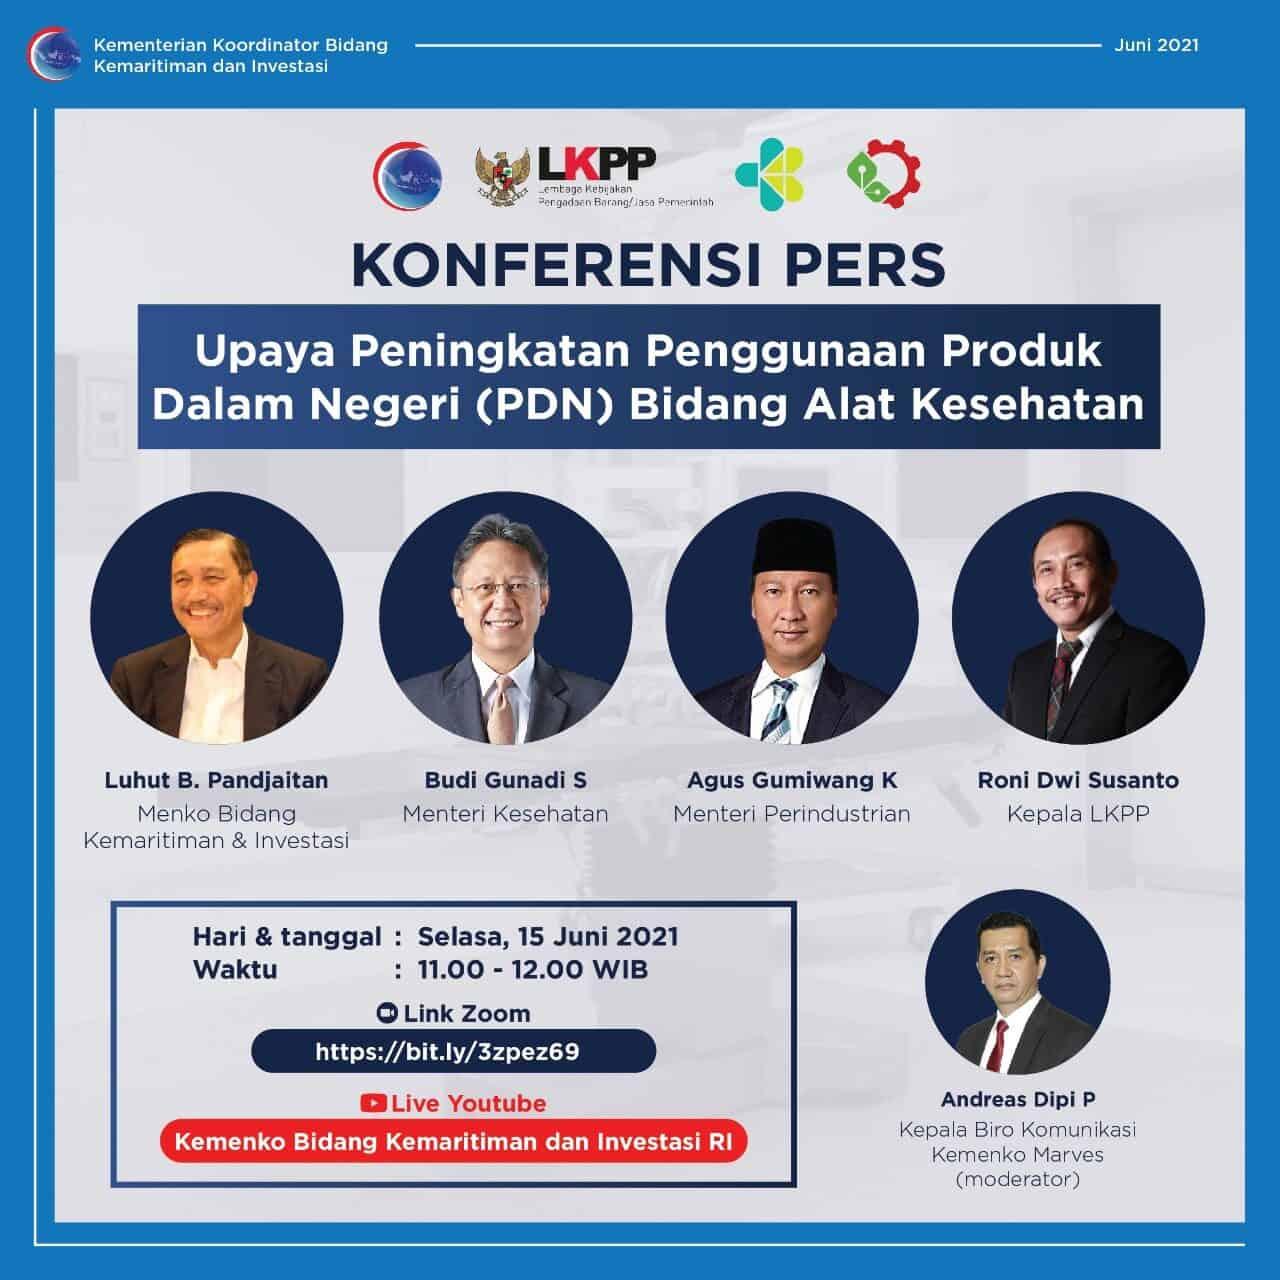 Pemerintah Tetapkan Tujuh Jurus Untuk Genjot Pemanfaatan Alkes Dalam Negeri Dalam Rangka Bangga Buatan Indonesia